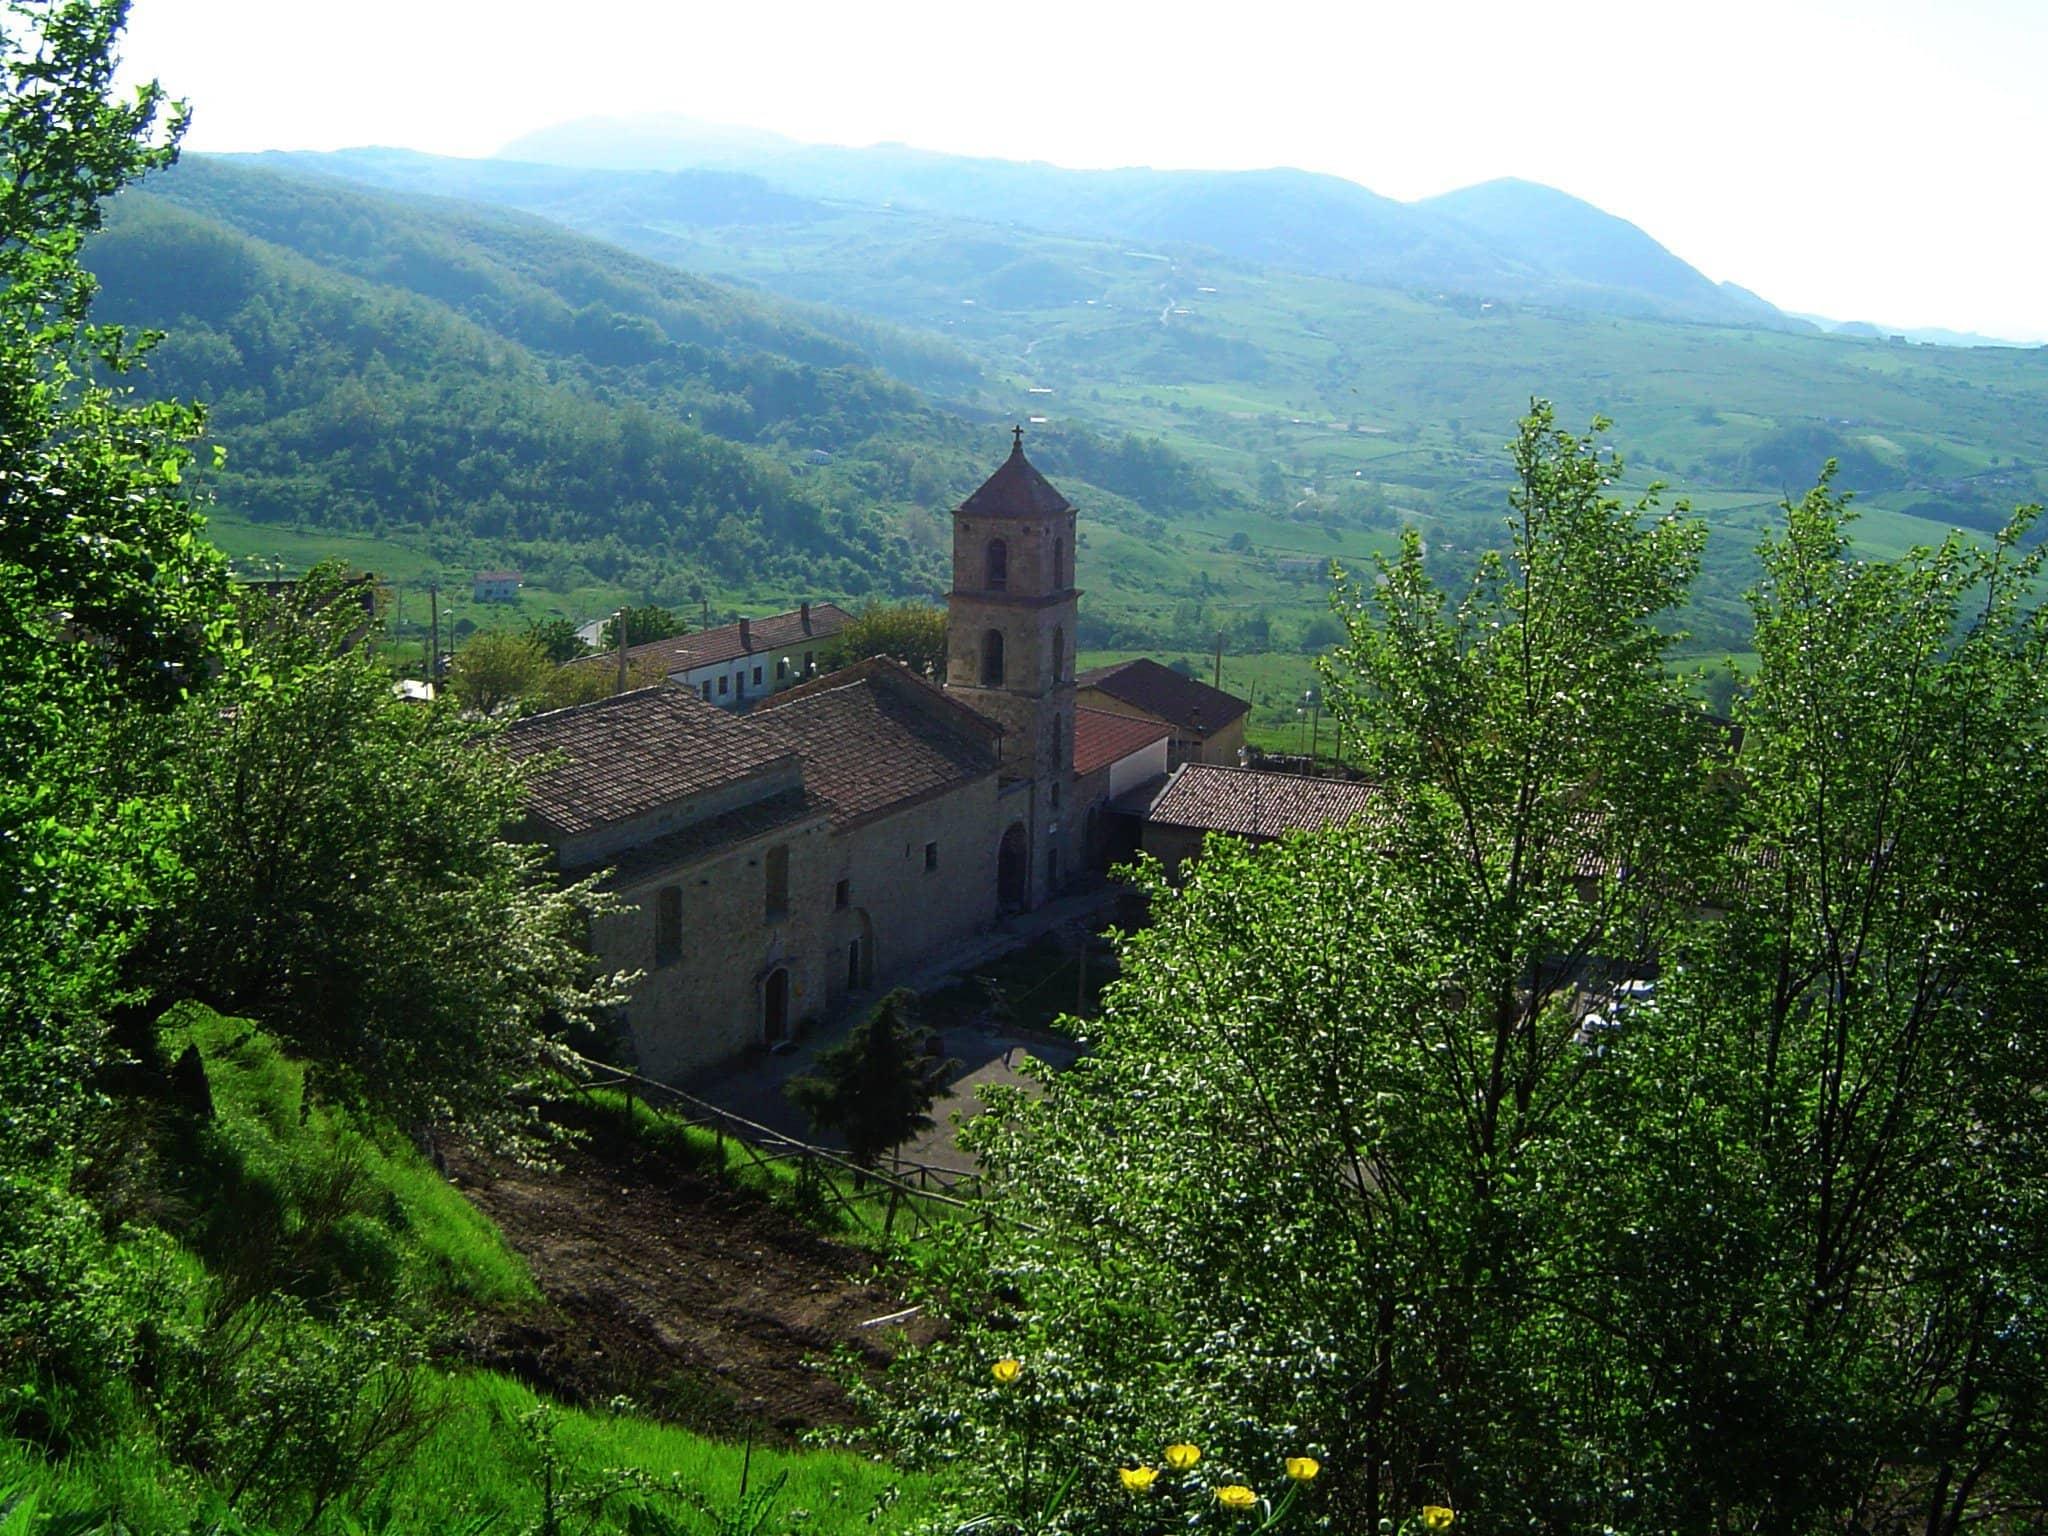 Basilicata e Campania unite dal turismo culturale